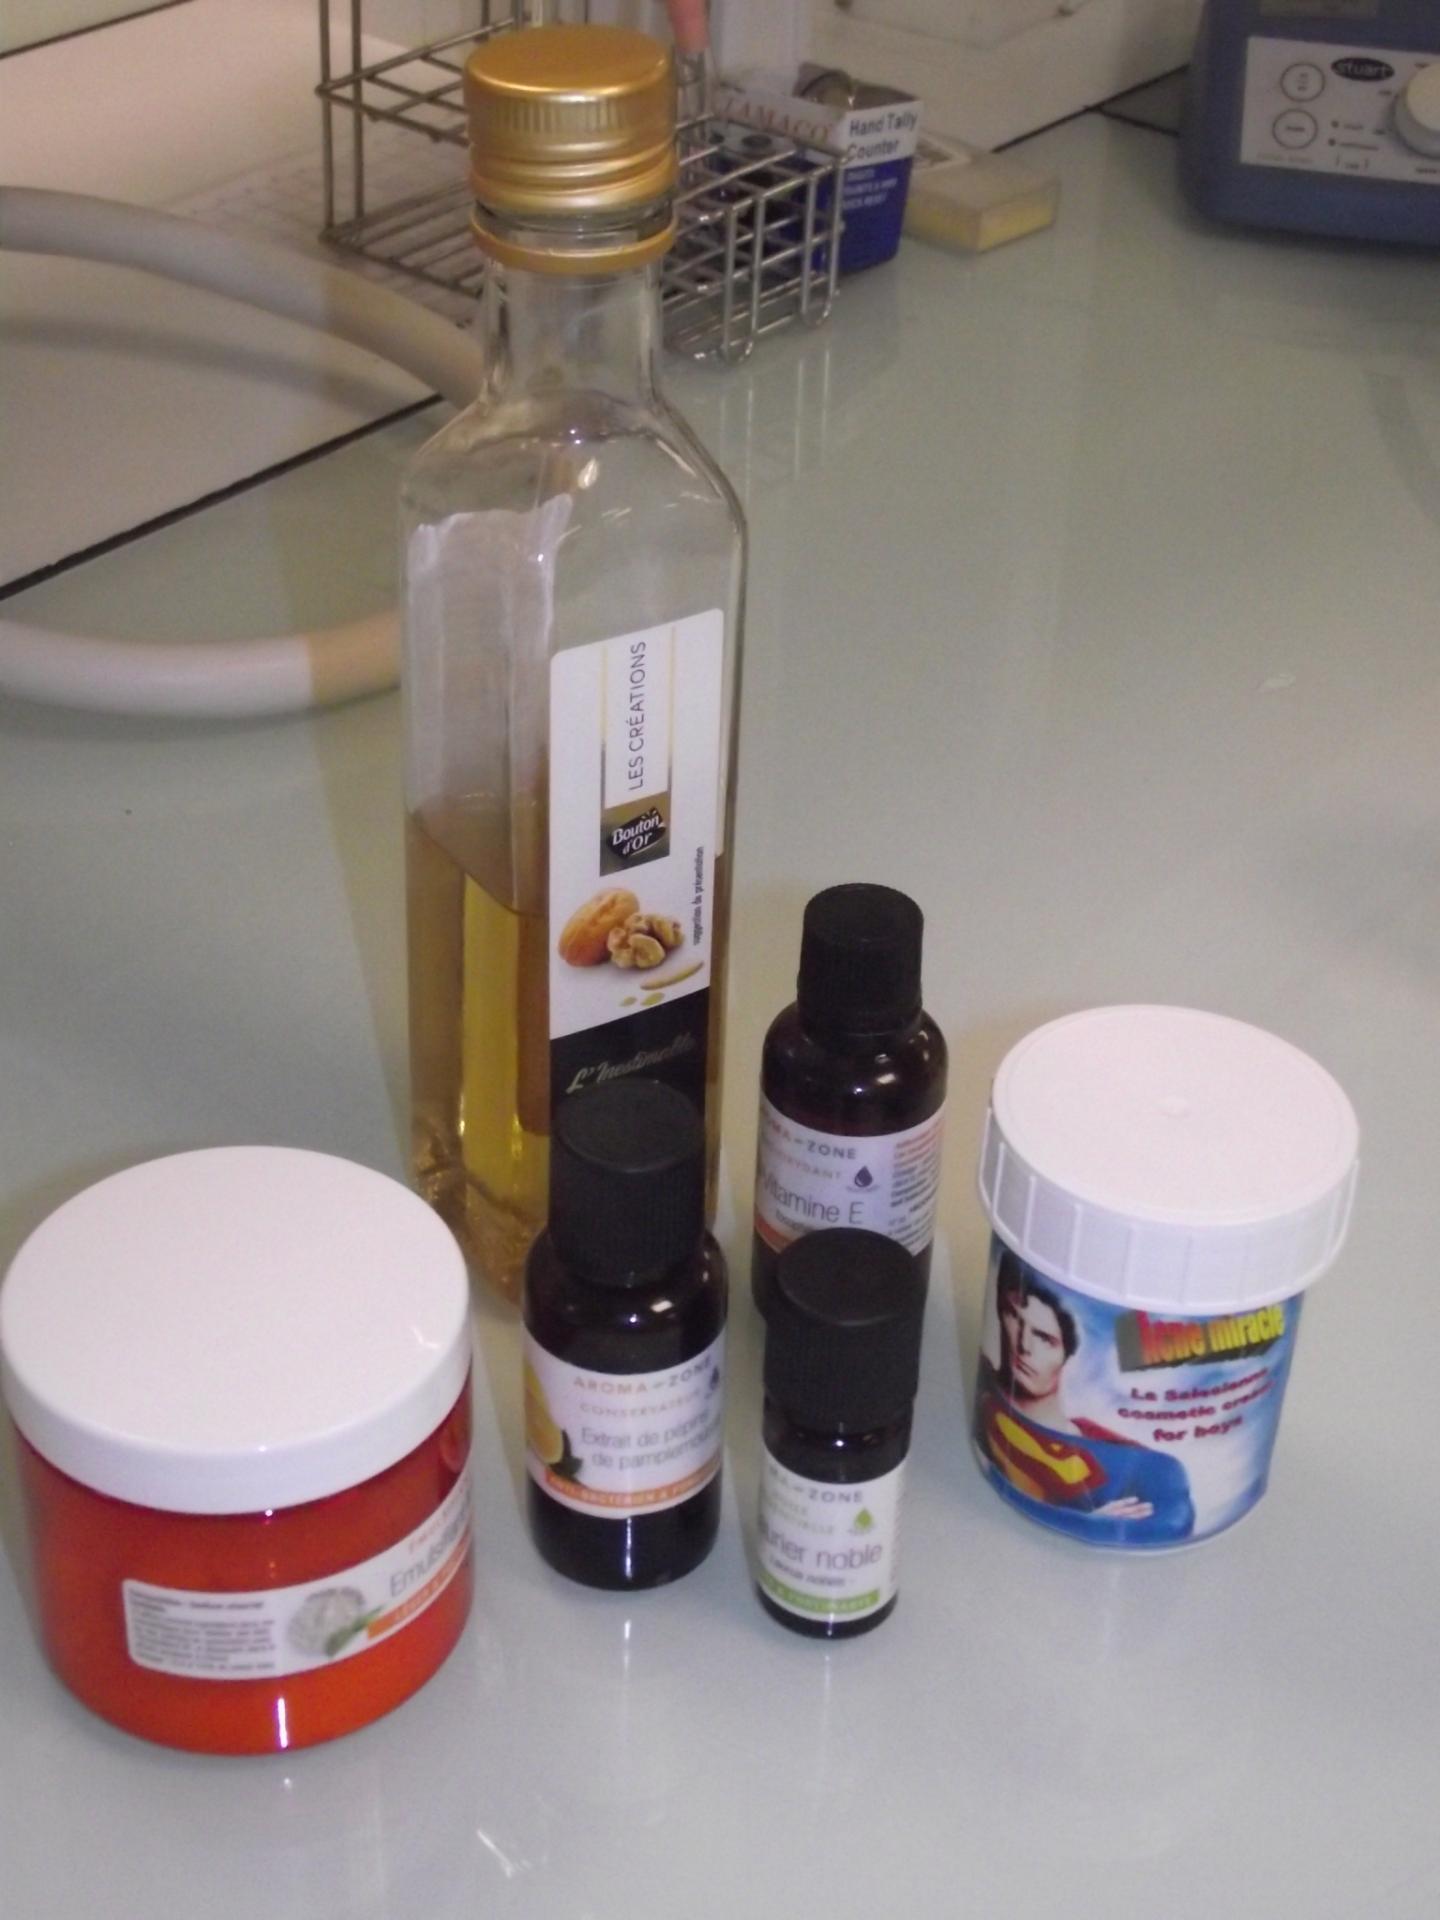 Stl fabrication creme acnee la salesienne st etienne 1